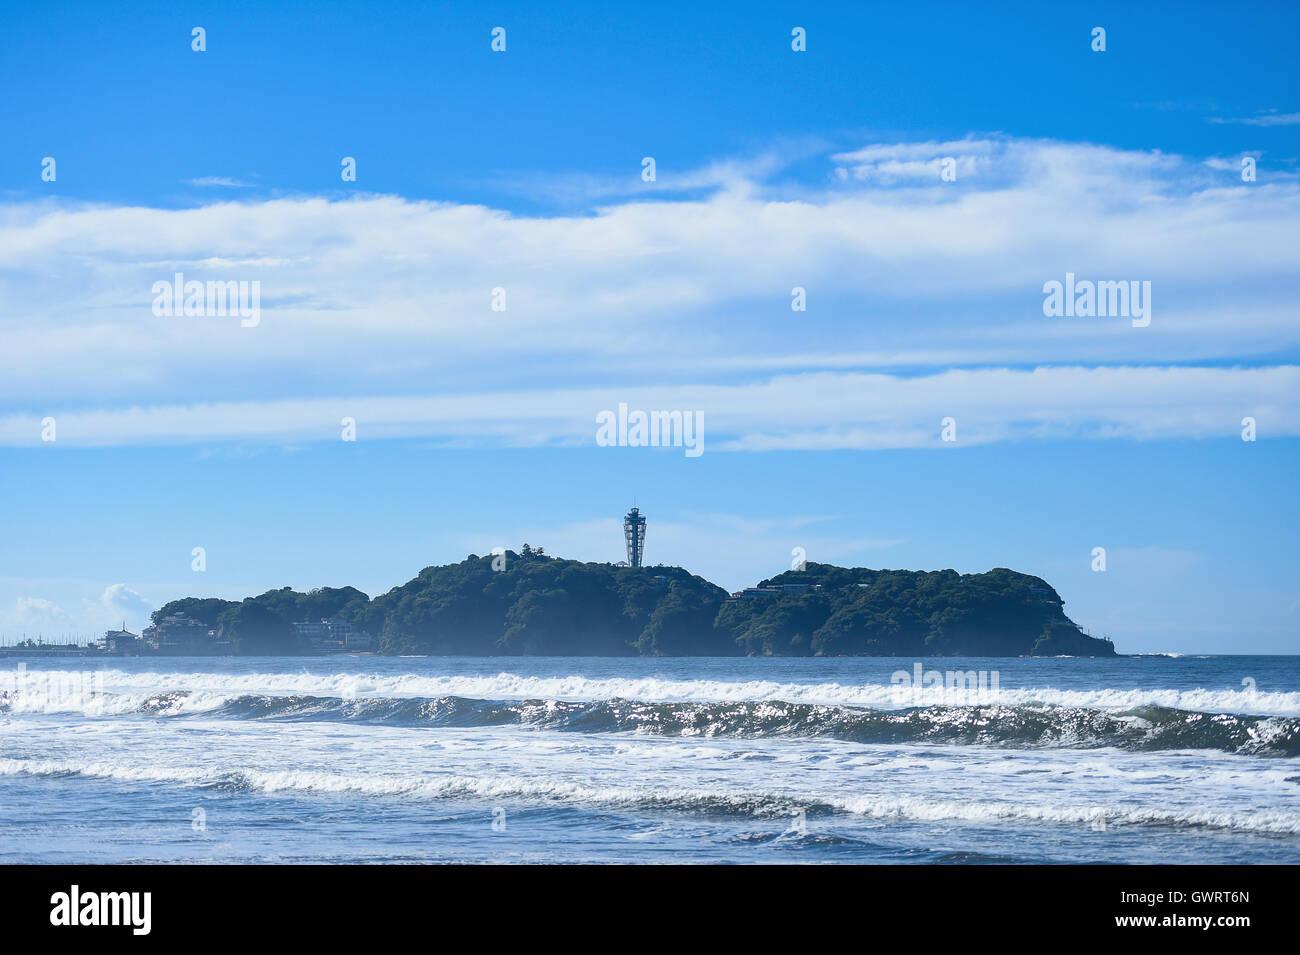 Beach in Enoshima, Kanagawa Prefecture, Japan - Stock Image